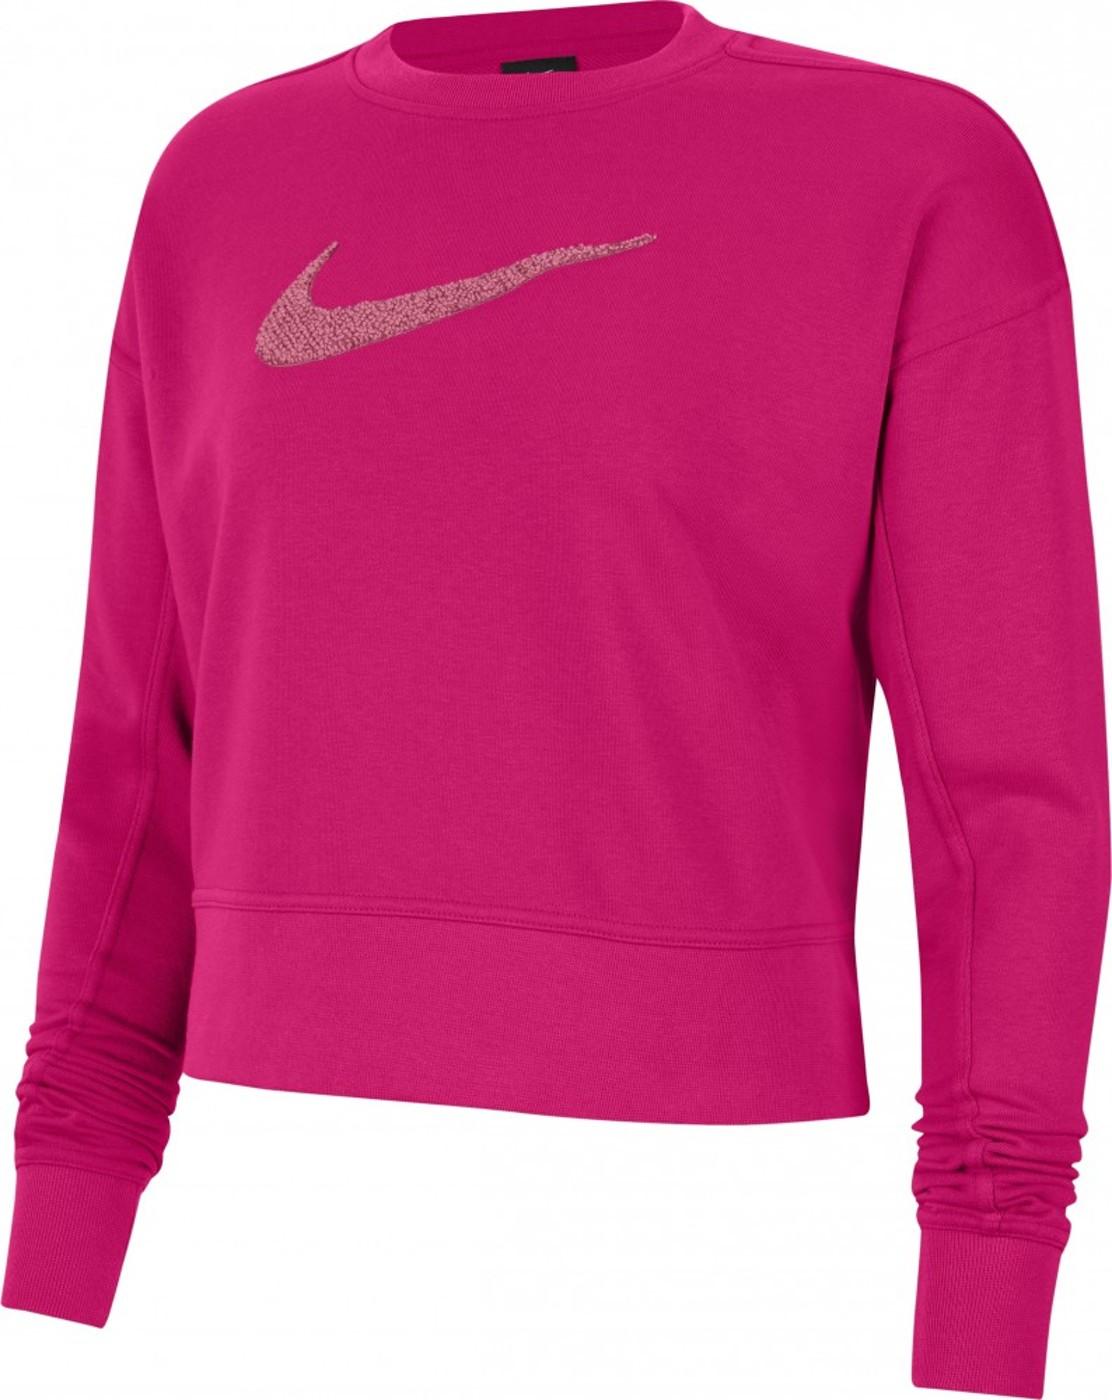 Nike Dri-FIT Get Fit S - Damen